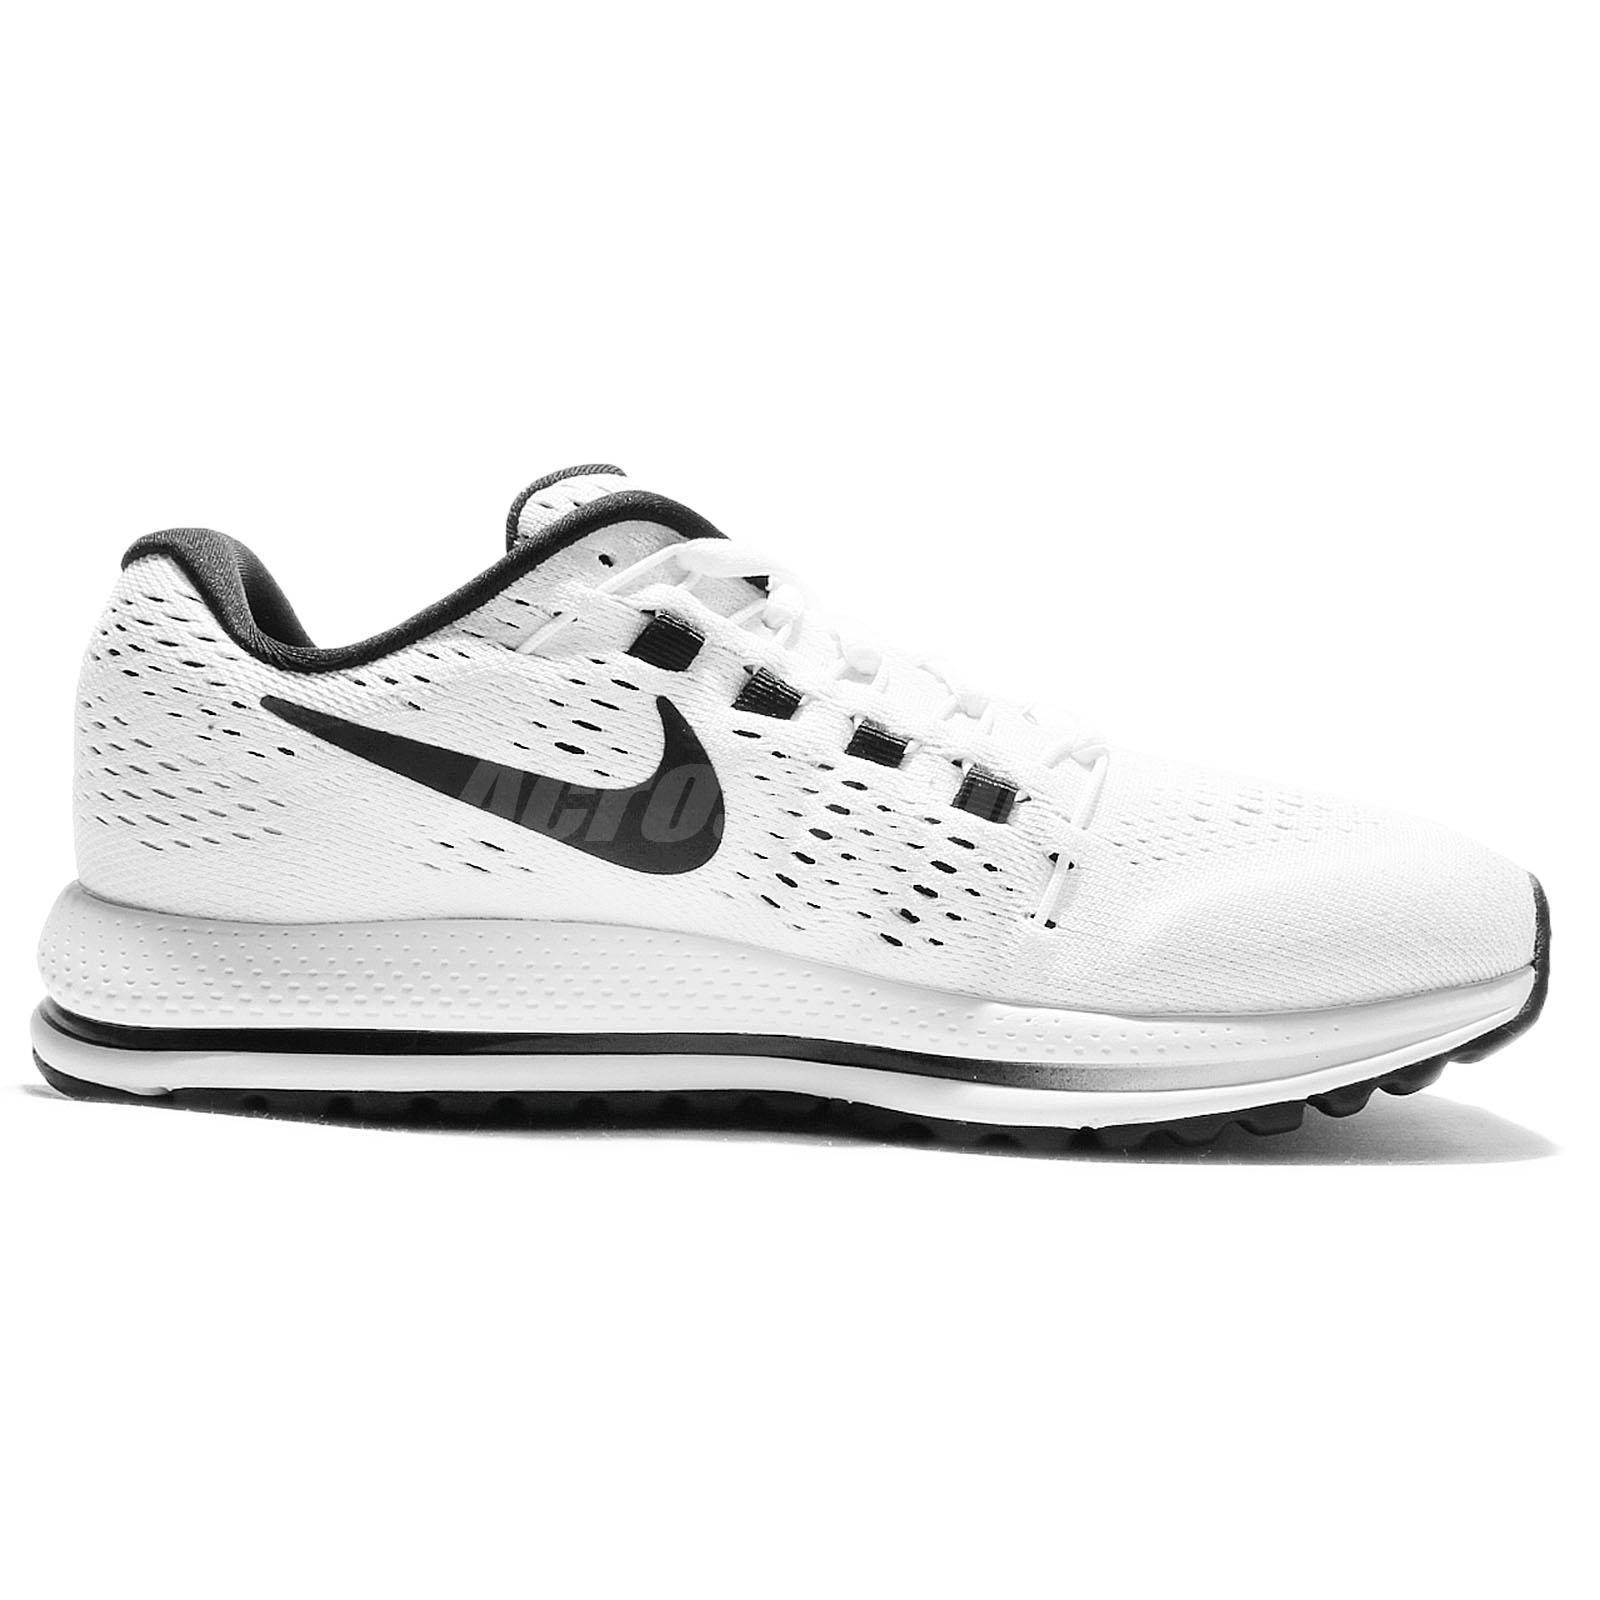 Nike Air Zoom Vomero Kvinner 100% igRKjISGl